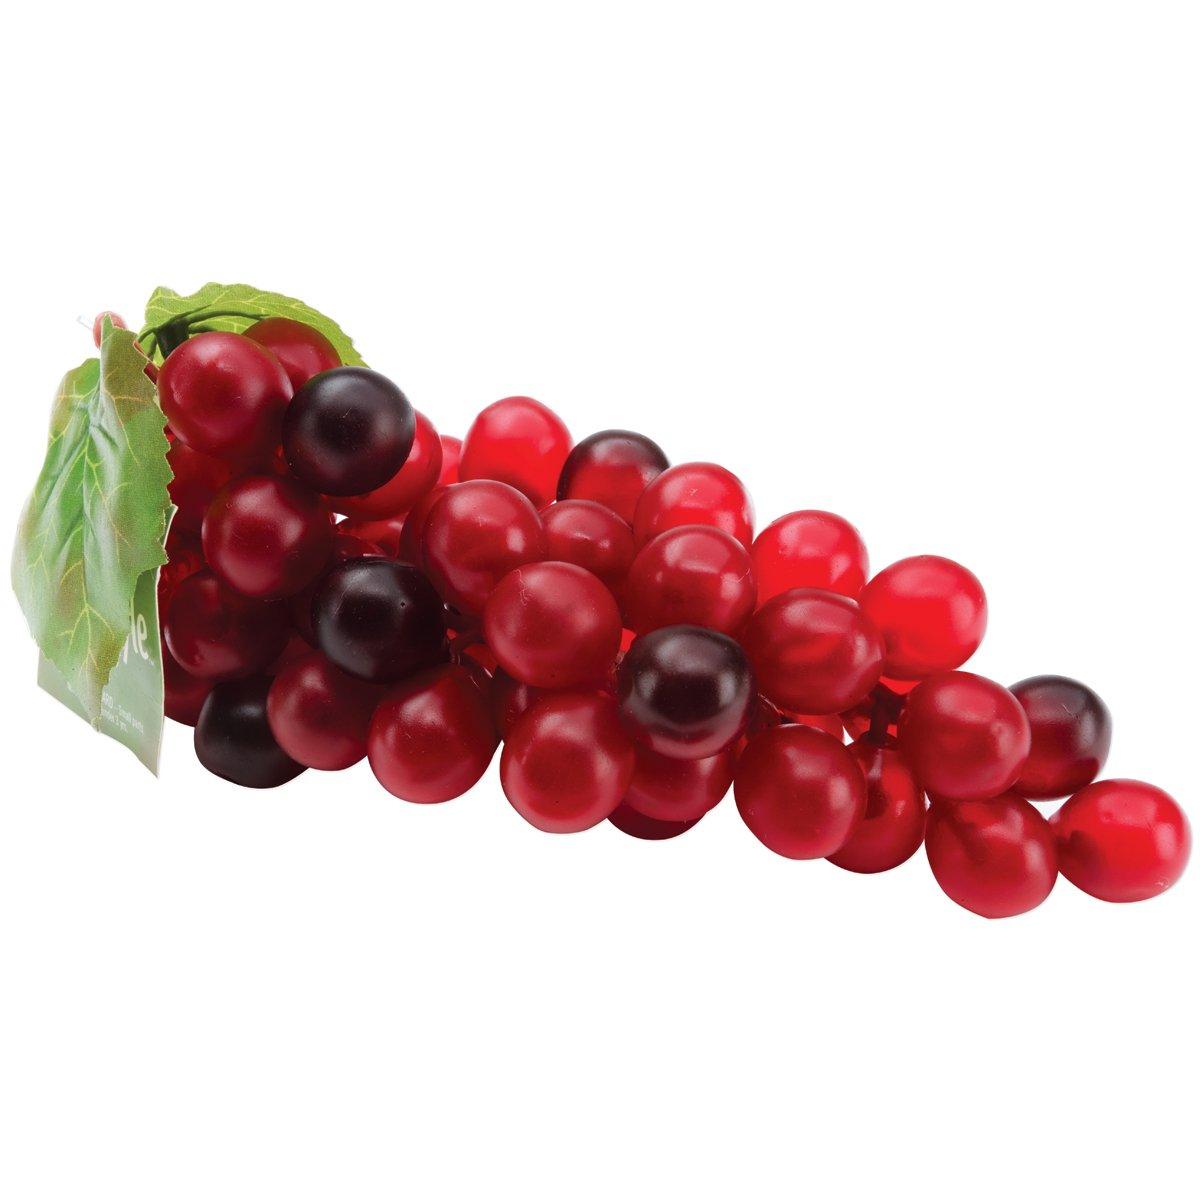 Floracraft Design It Simple Decorative Fruit, Large Green Grapes RS9896